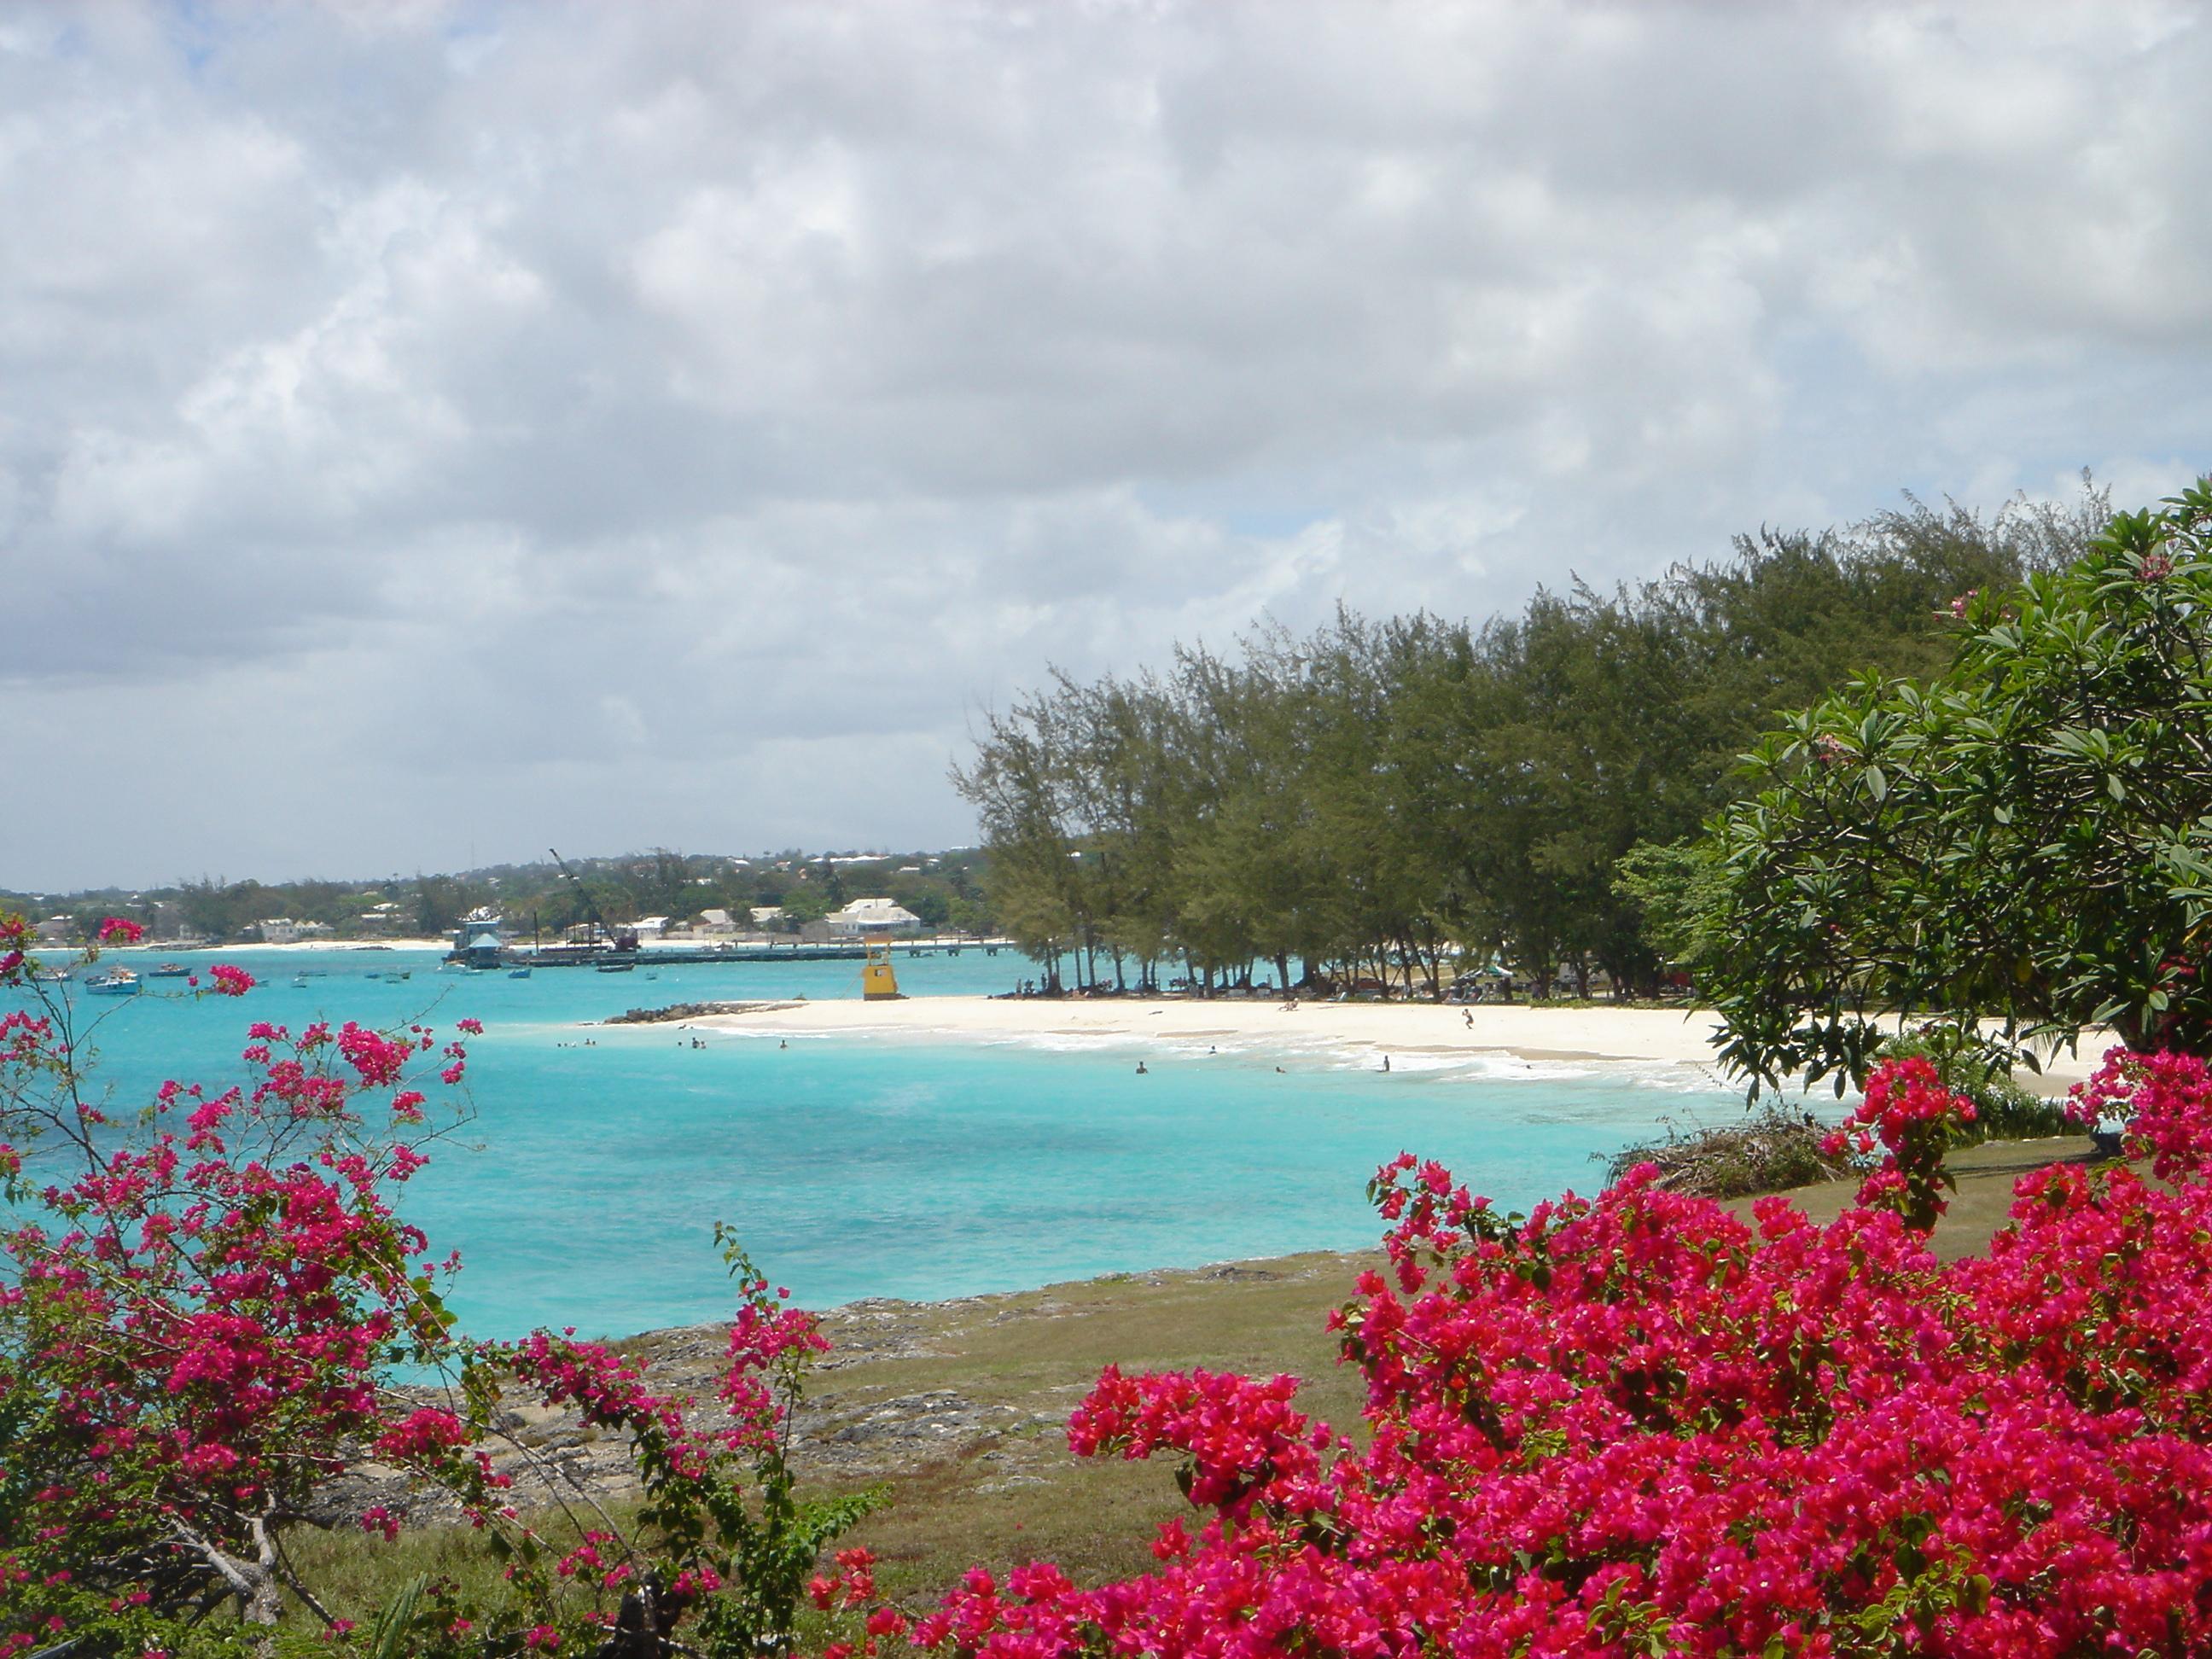 miami beach, barbados - wikipedia